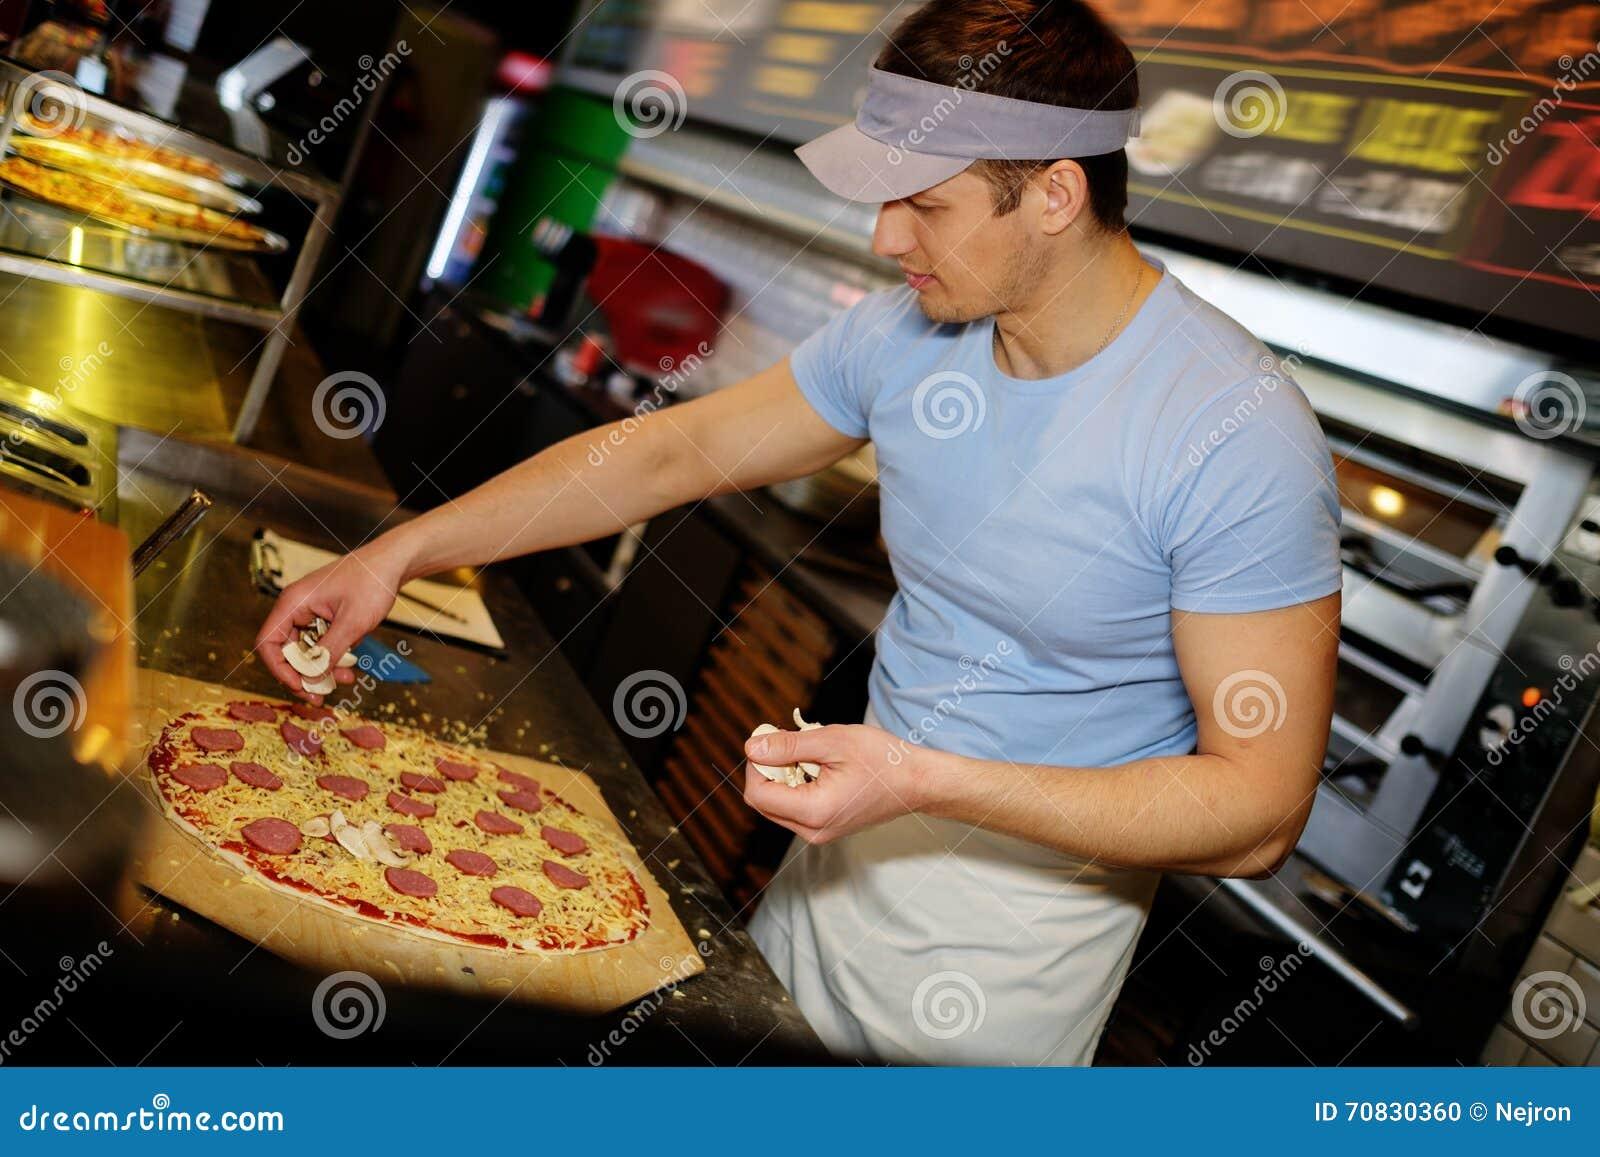 Pizzeria Kitchen handsome pizzaiolo making pizza at kitchen in pizzeria. stock